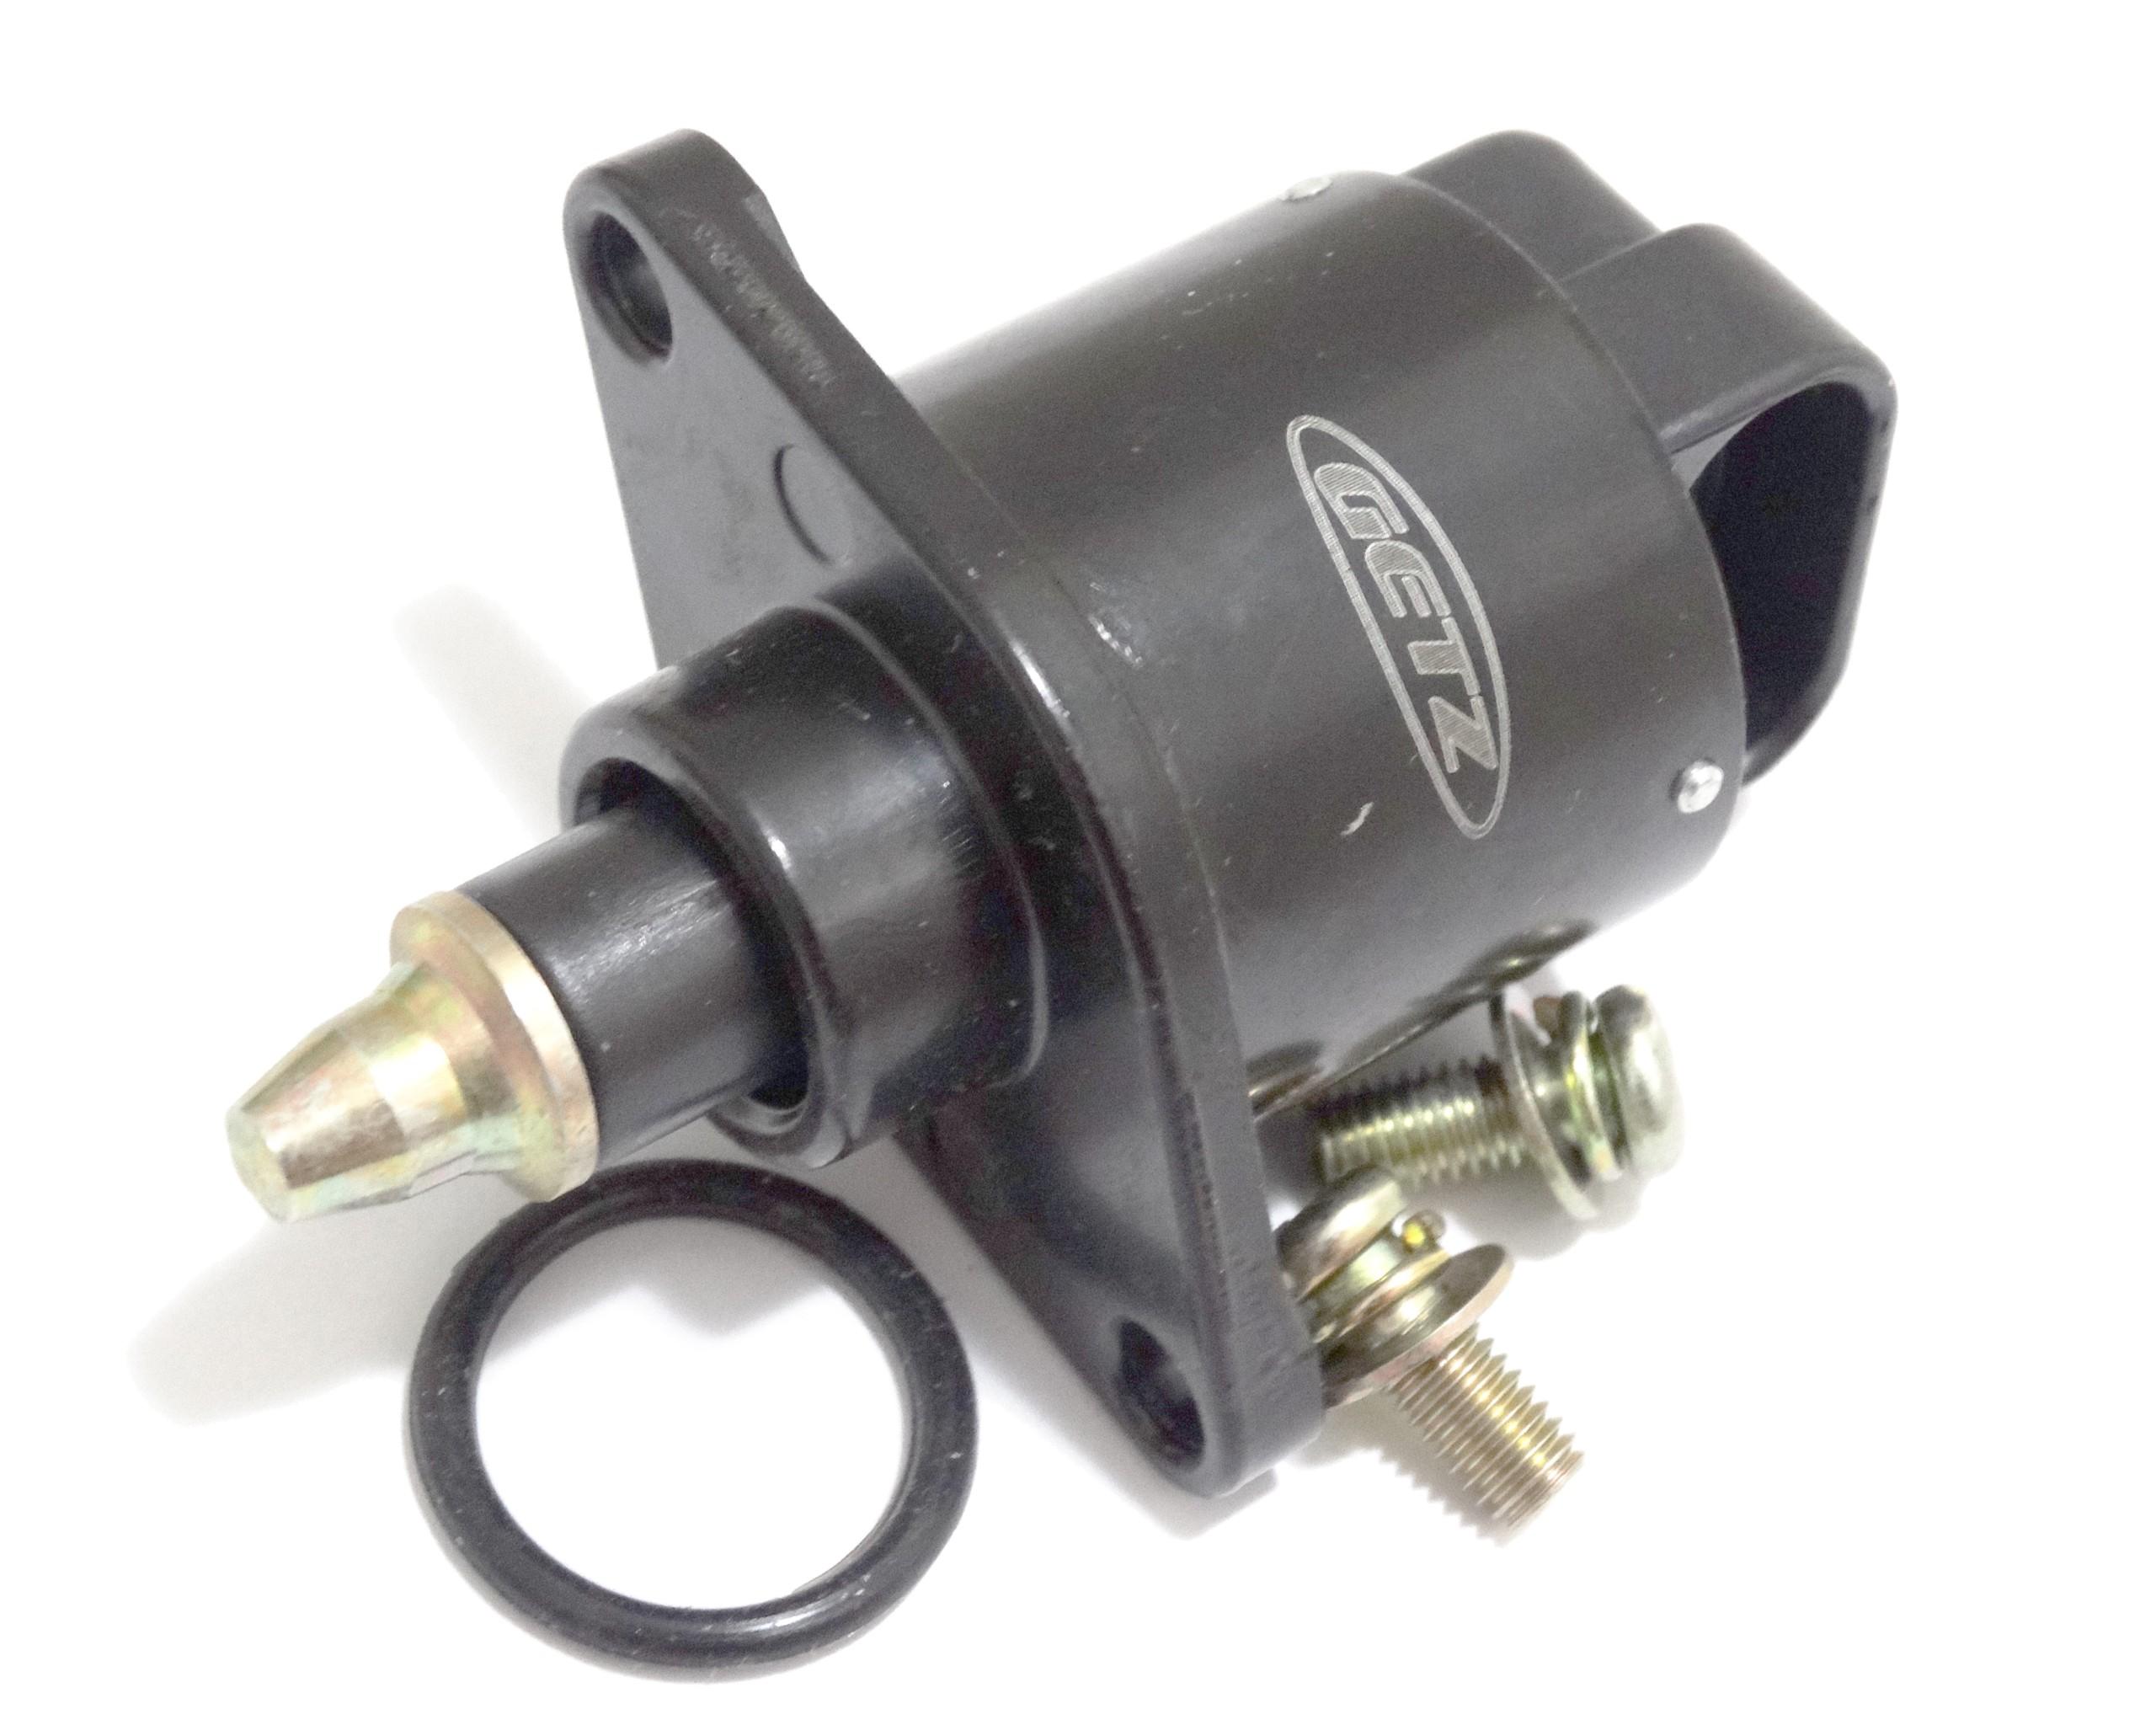 двигатель шаговый fiat seicento 09 11 панда b01